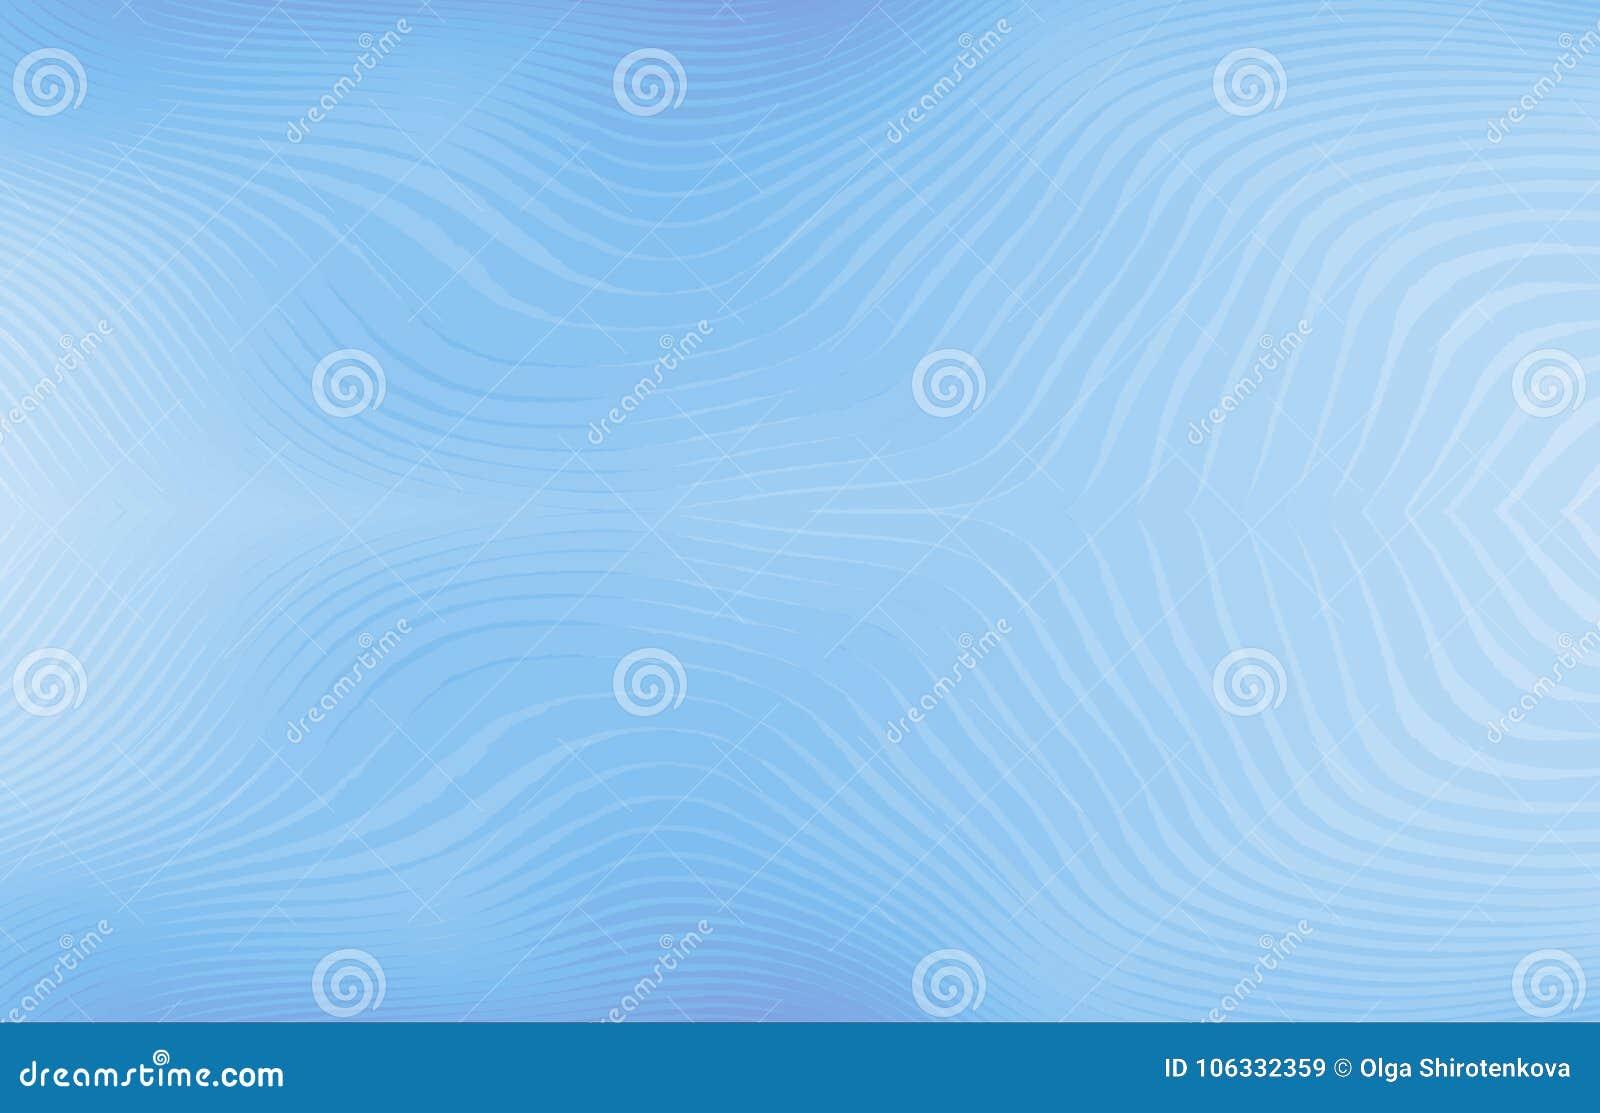 821057b9 Light blue background. Wavy pattern. Darkened bottom and top. Modern art.  Royalty-Free Illustration